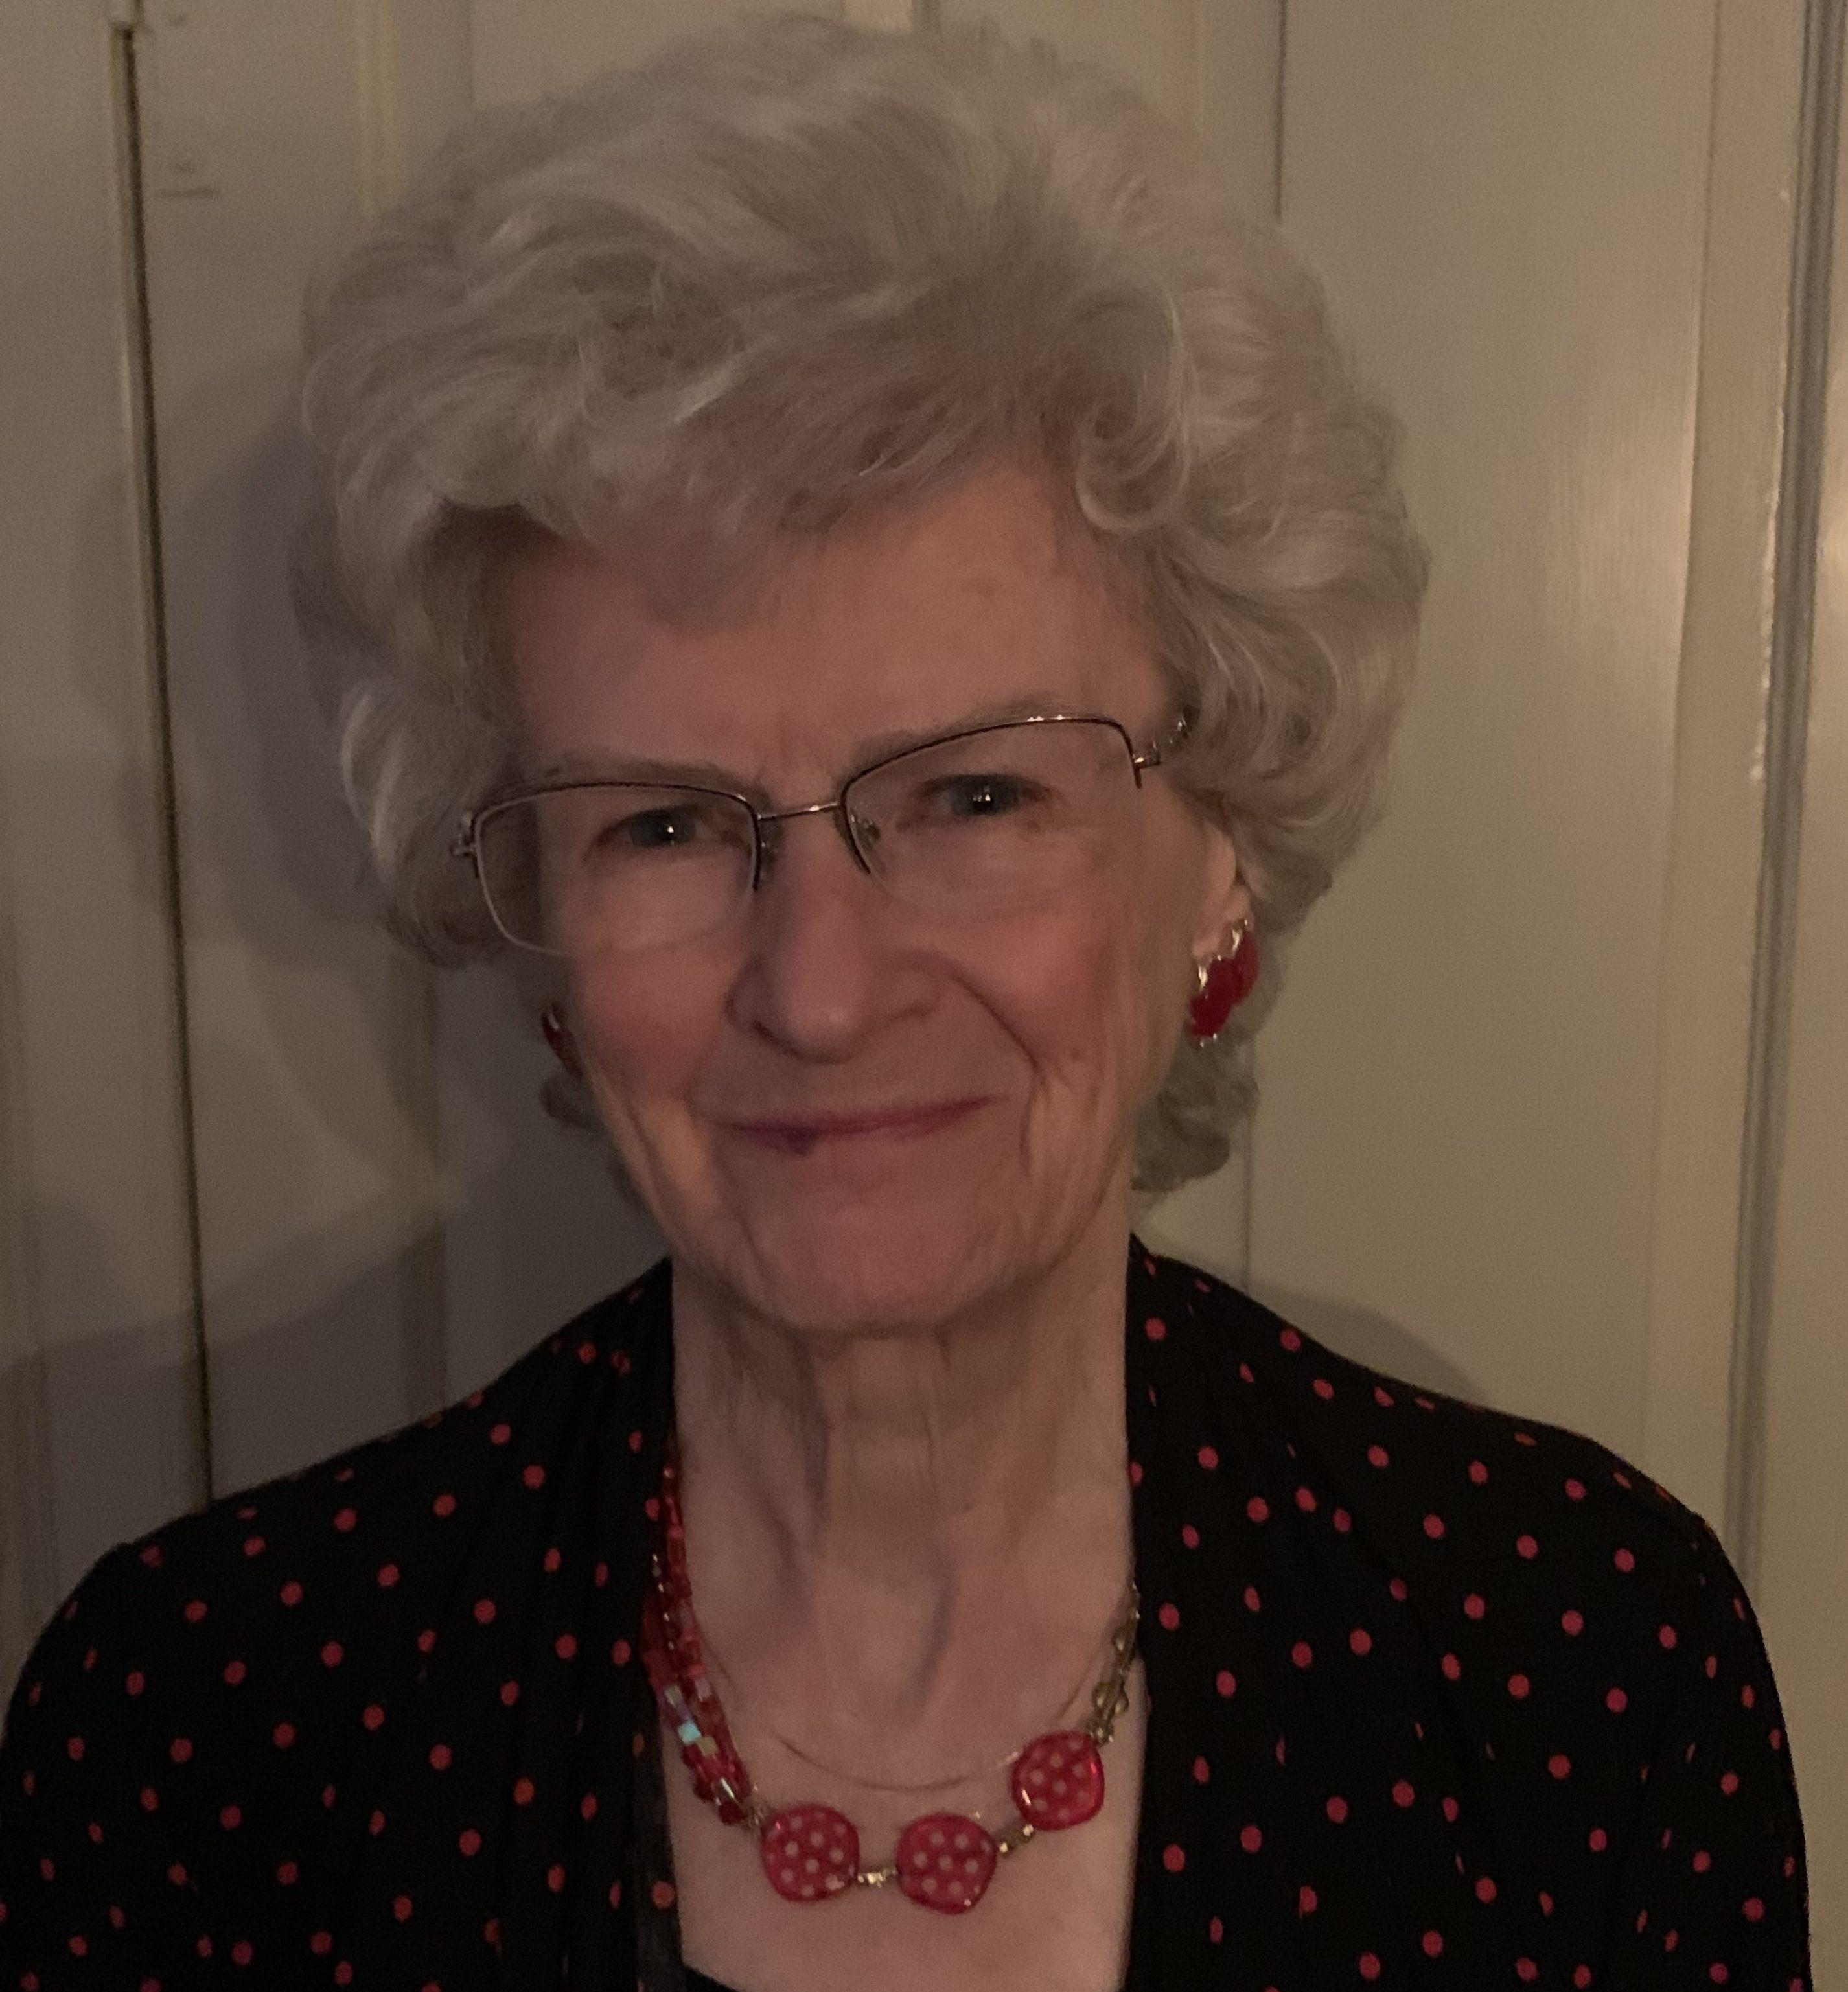 Shirley Weaver | Geriatrics Education Mentor, University of New England